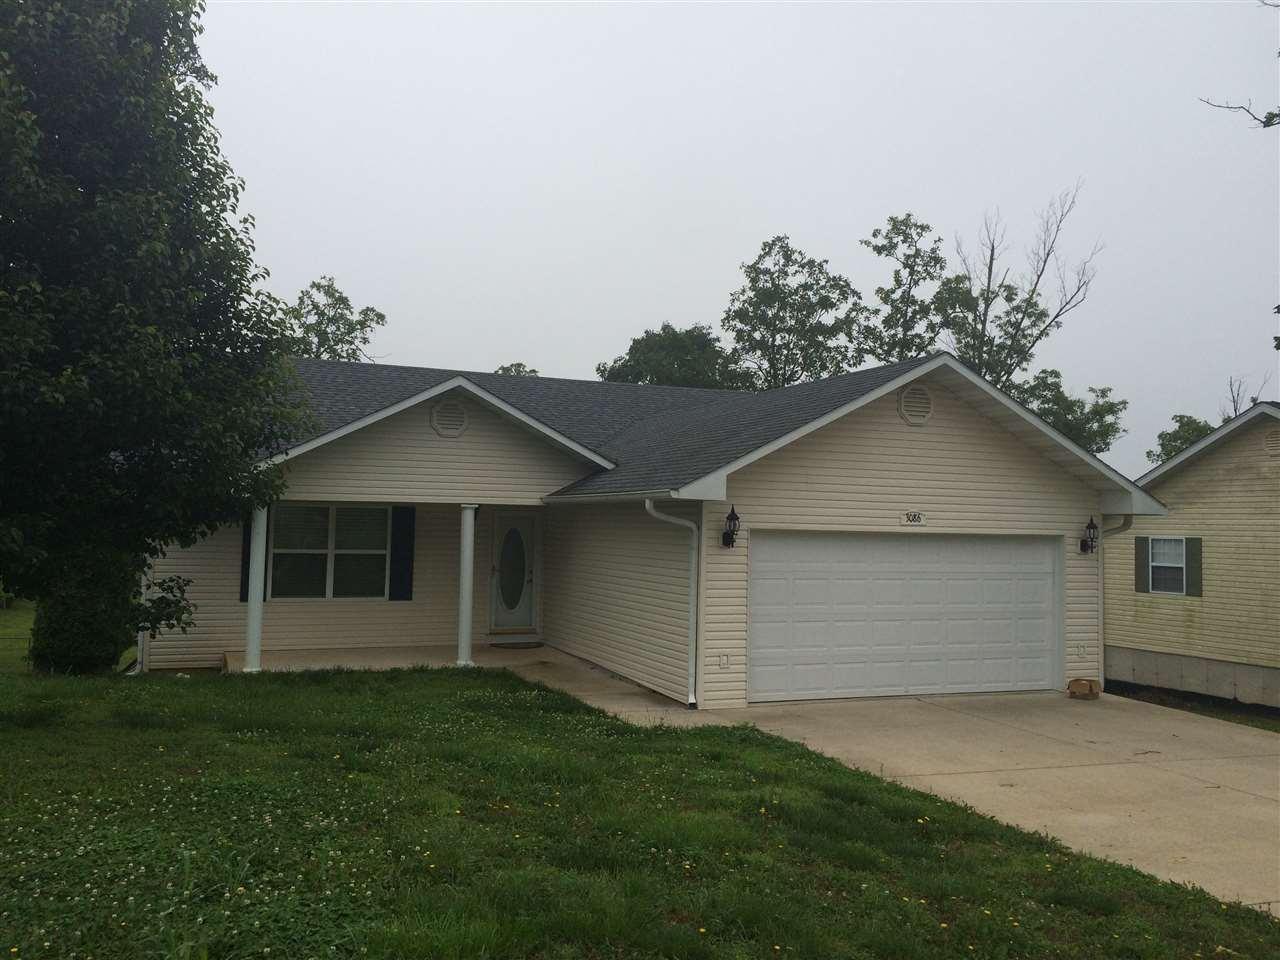 Rental Homes for Rent, ListingId:33557157, location: 3086 Elaine Ave. Poplar Bluff 63901